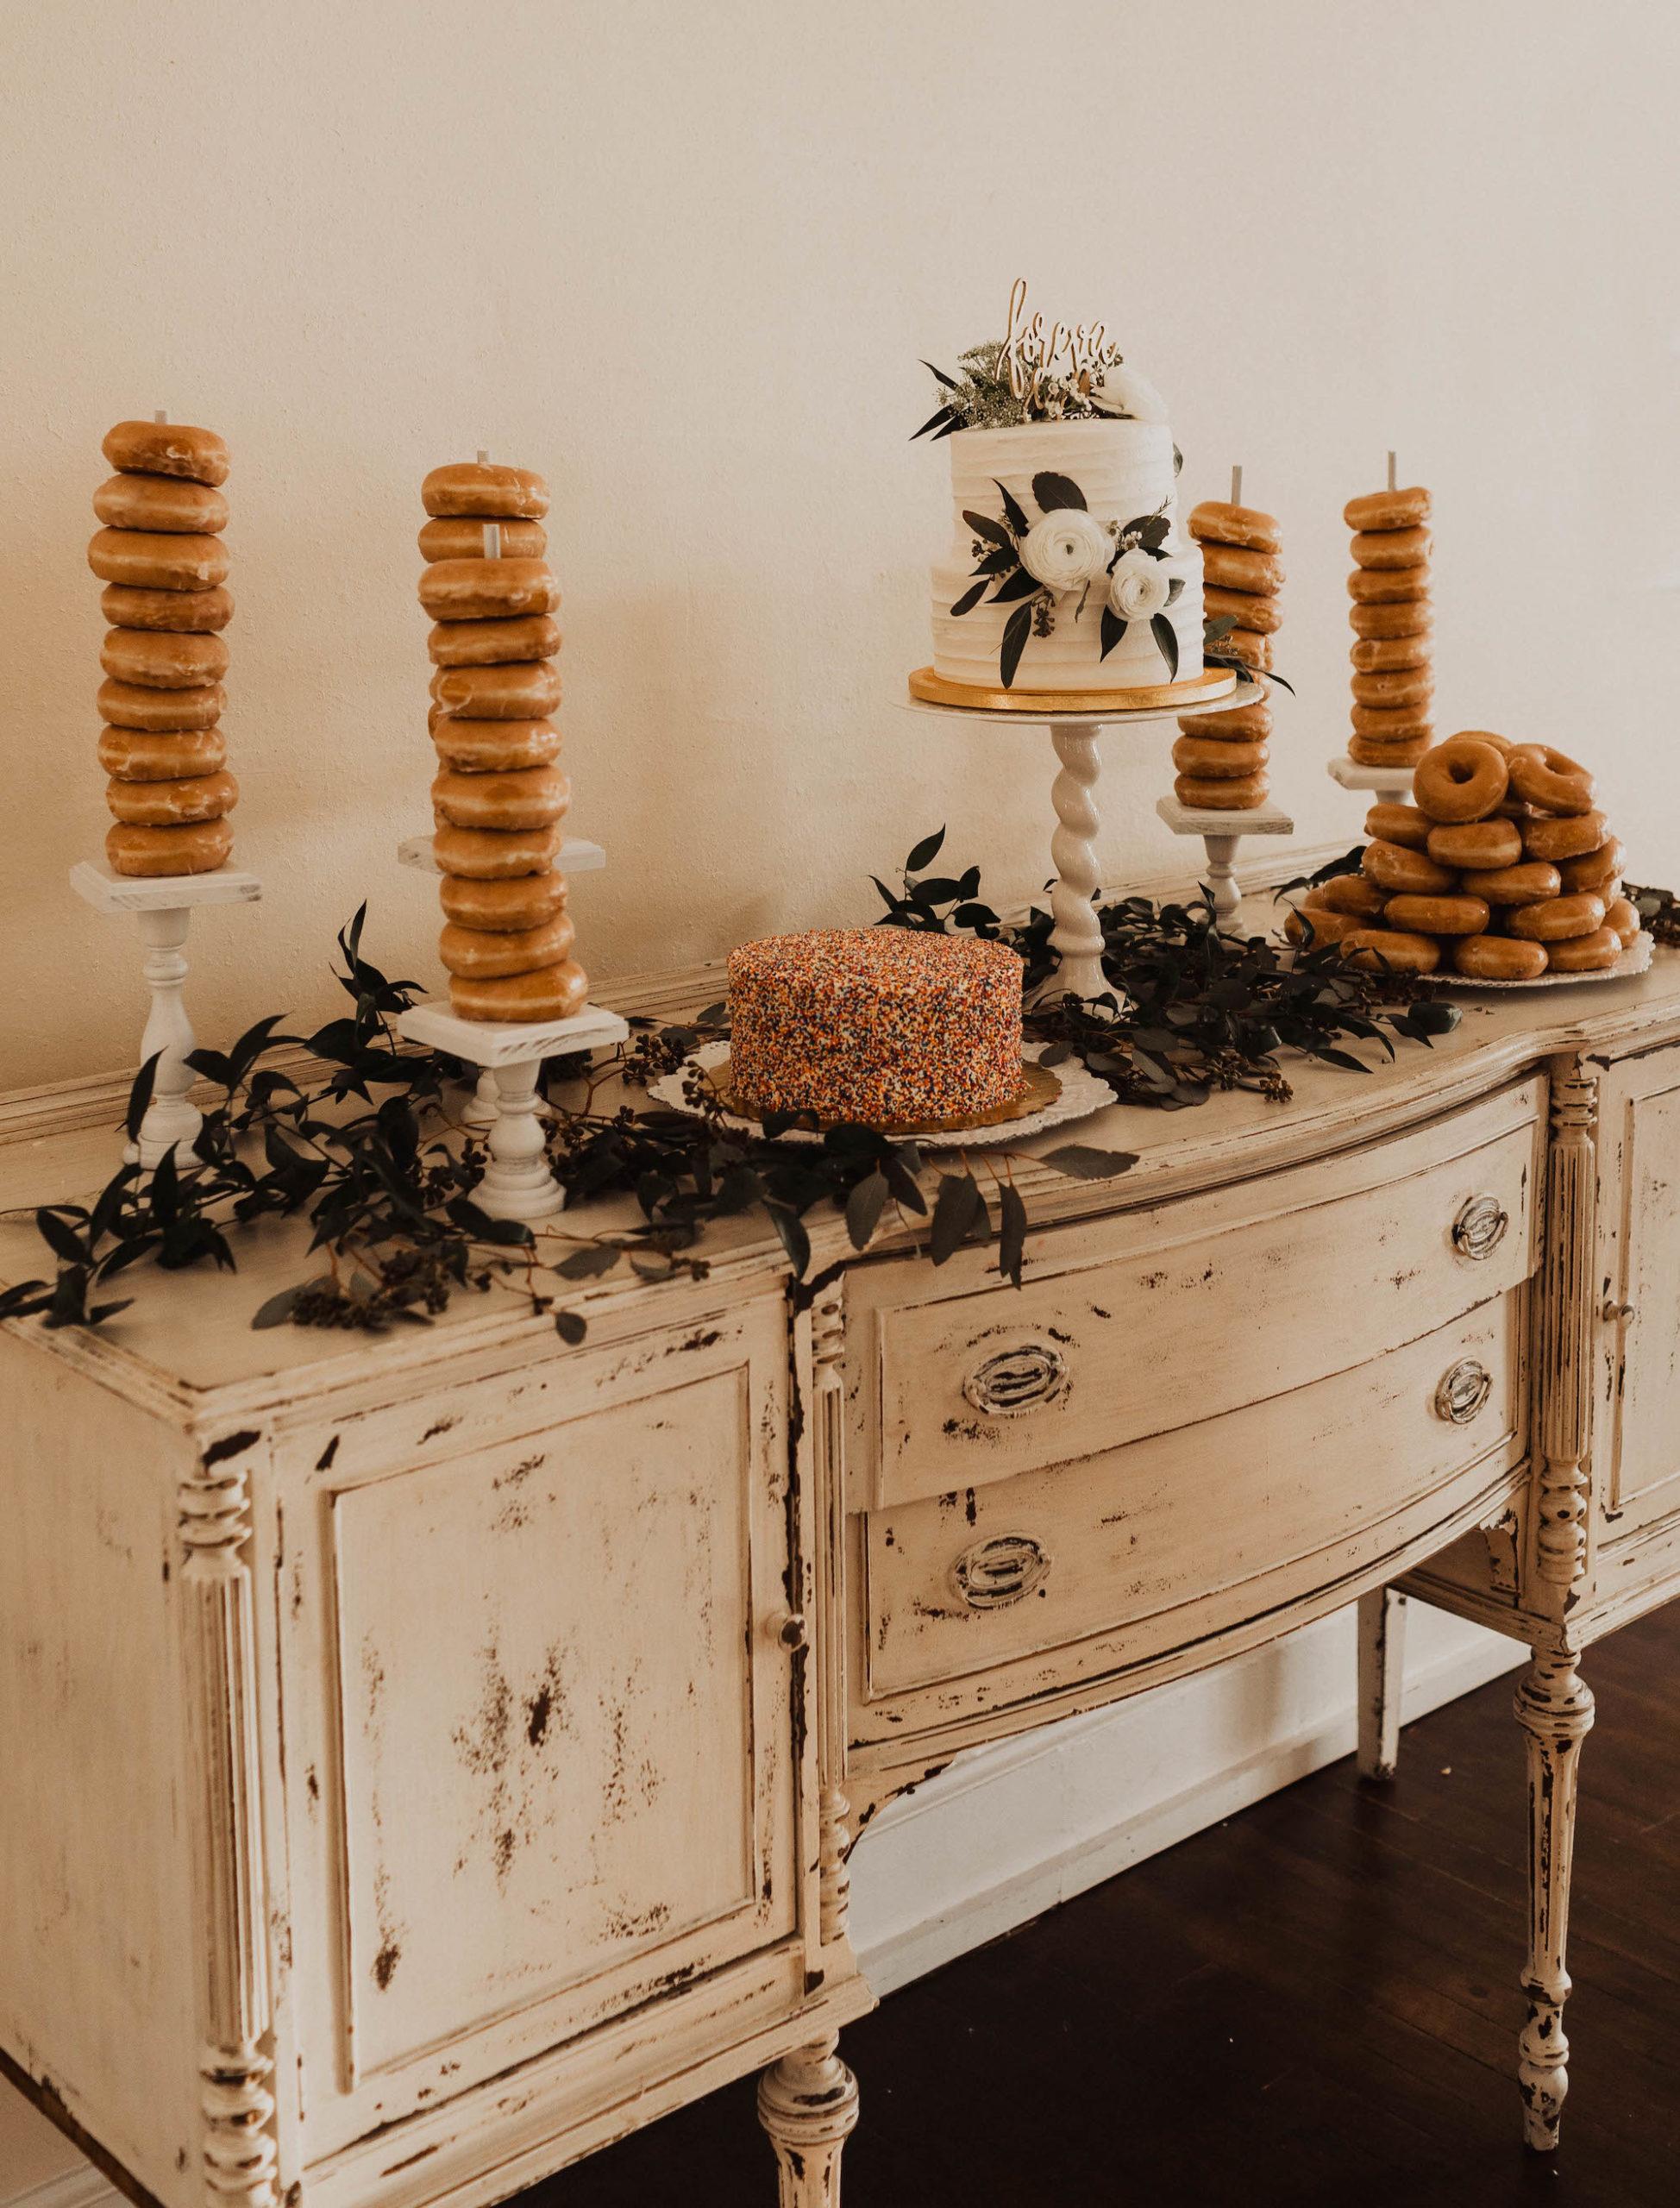 Antique White Dresser Dessert Table Setup, Krispy Kreme Donuts on Spindles, Two Tier White Ruffled Wedding Cake with Roses and Eucalyptus